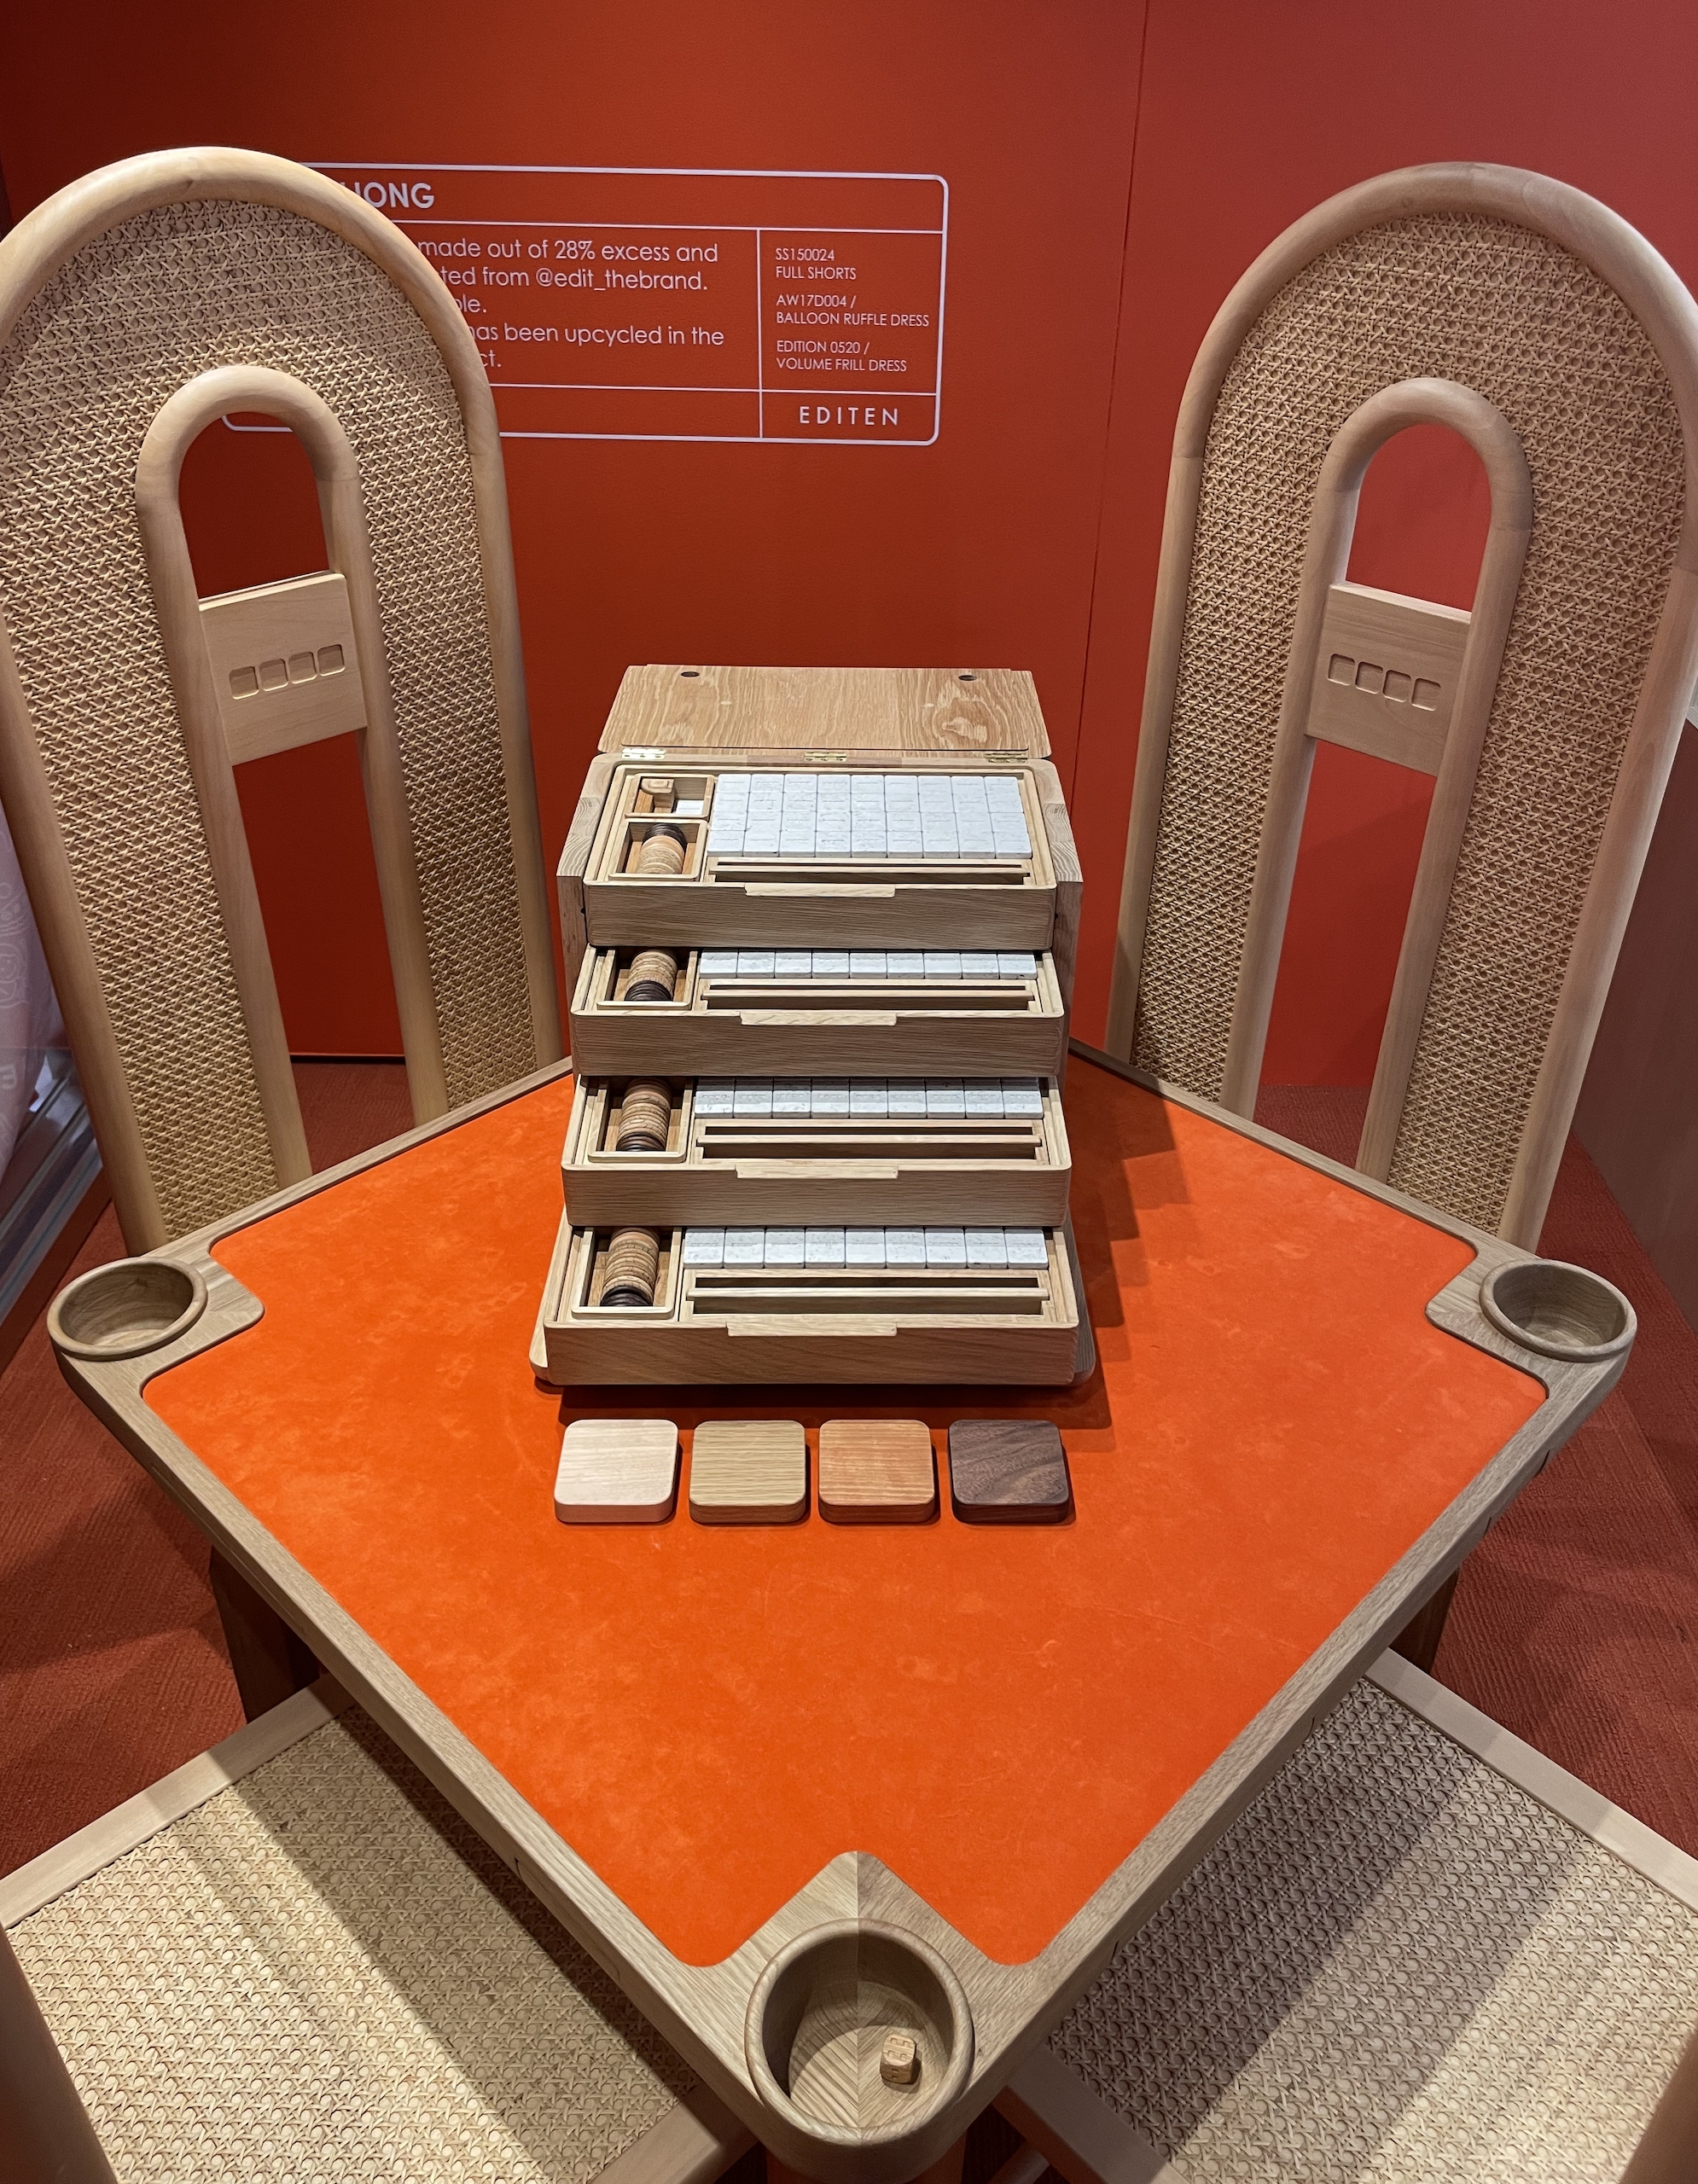 ode to mahjong installation edit x editecture sustainable mahjong set box